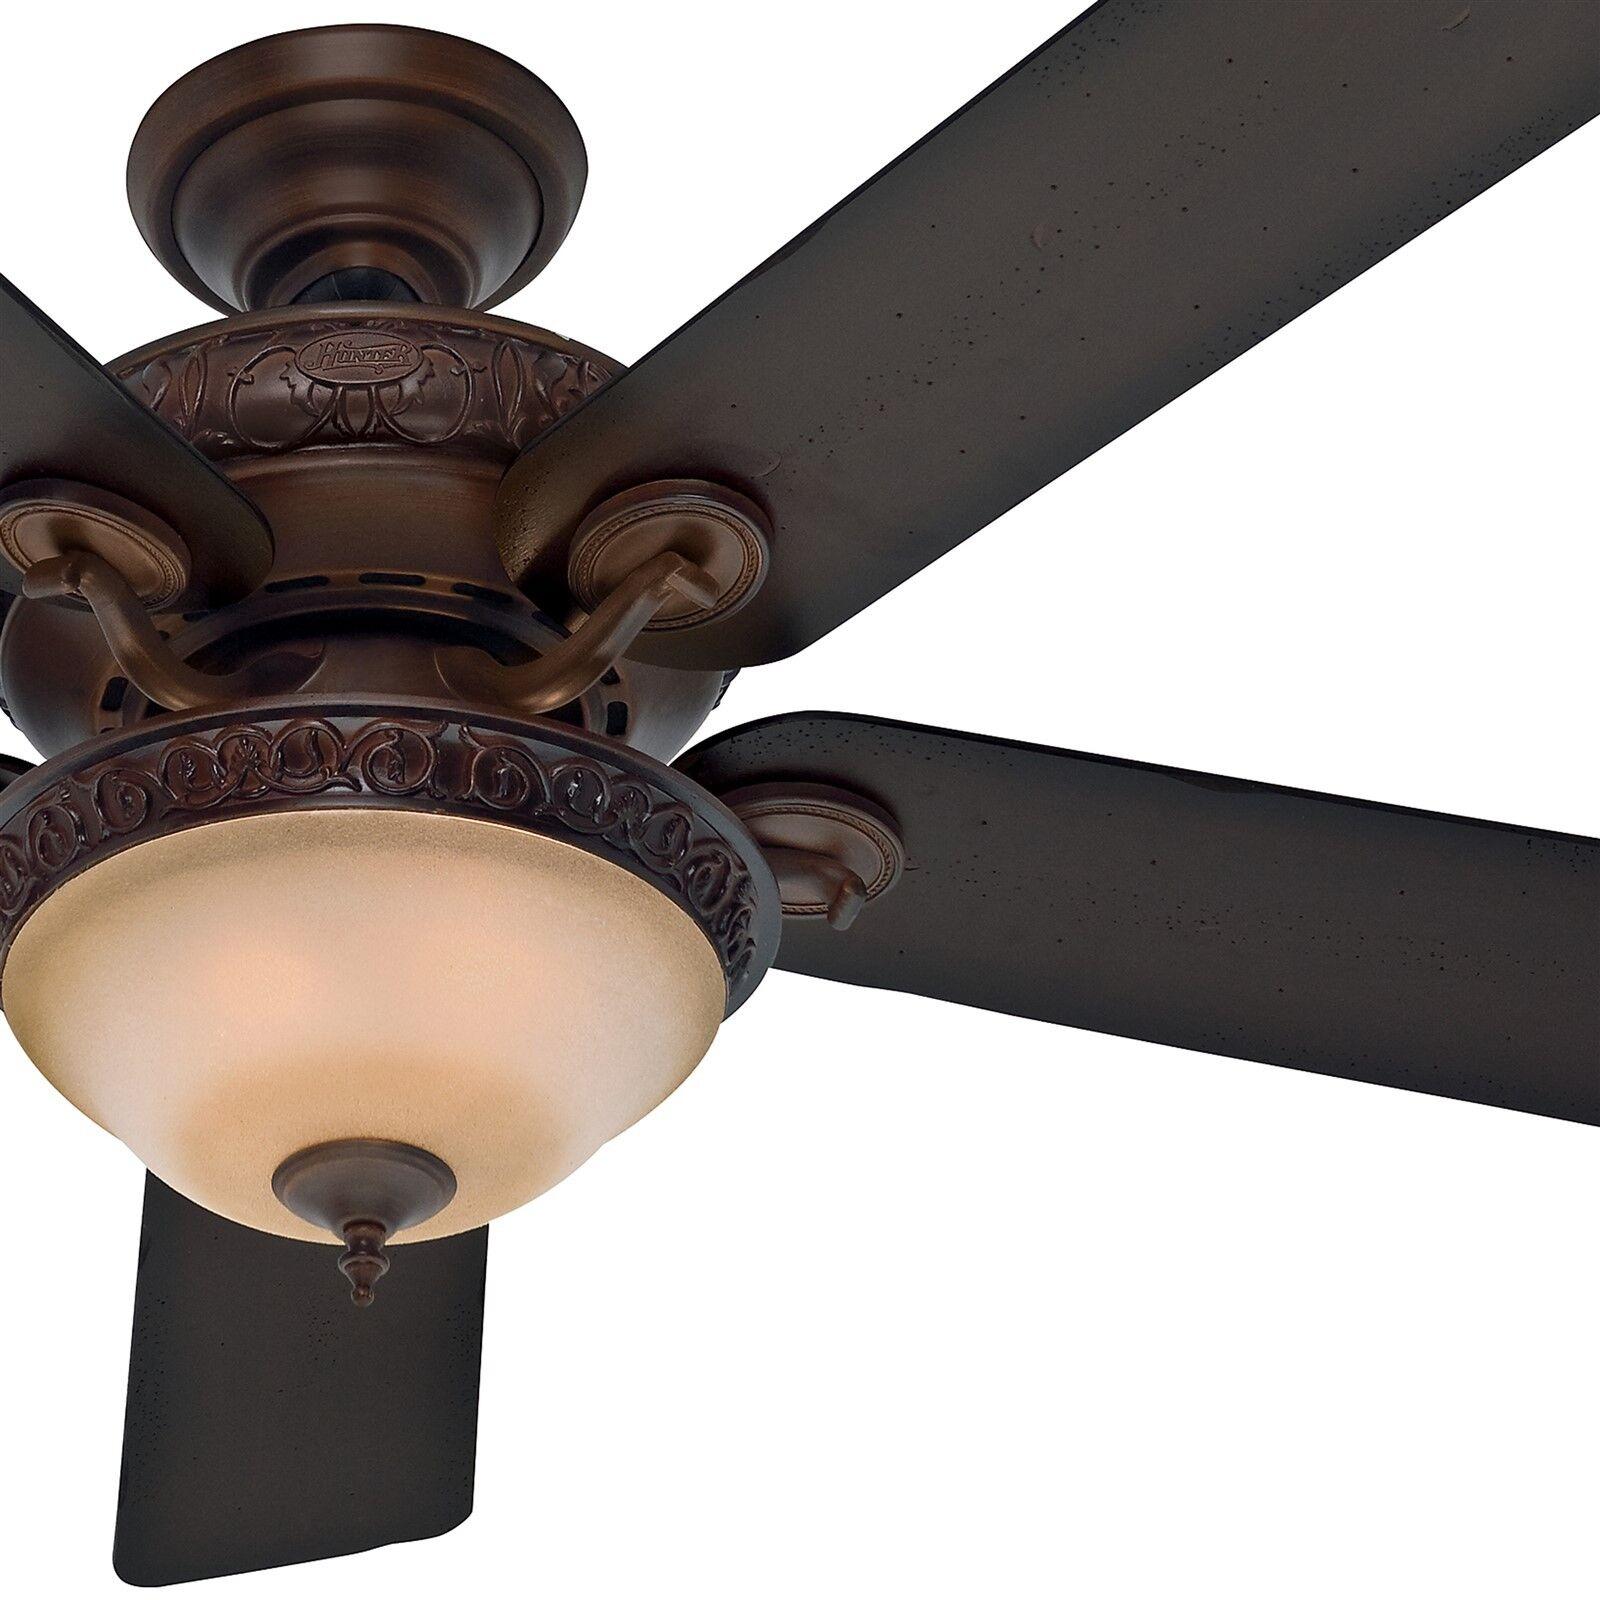 Barn Wood Ceiling Fan : Hunter quot brushed cocoa ceiling fan aged barn wood